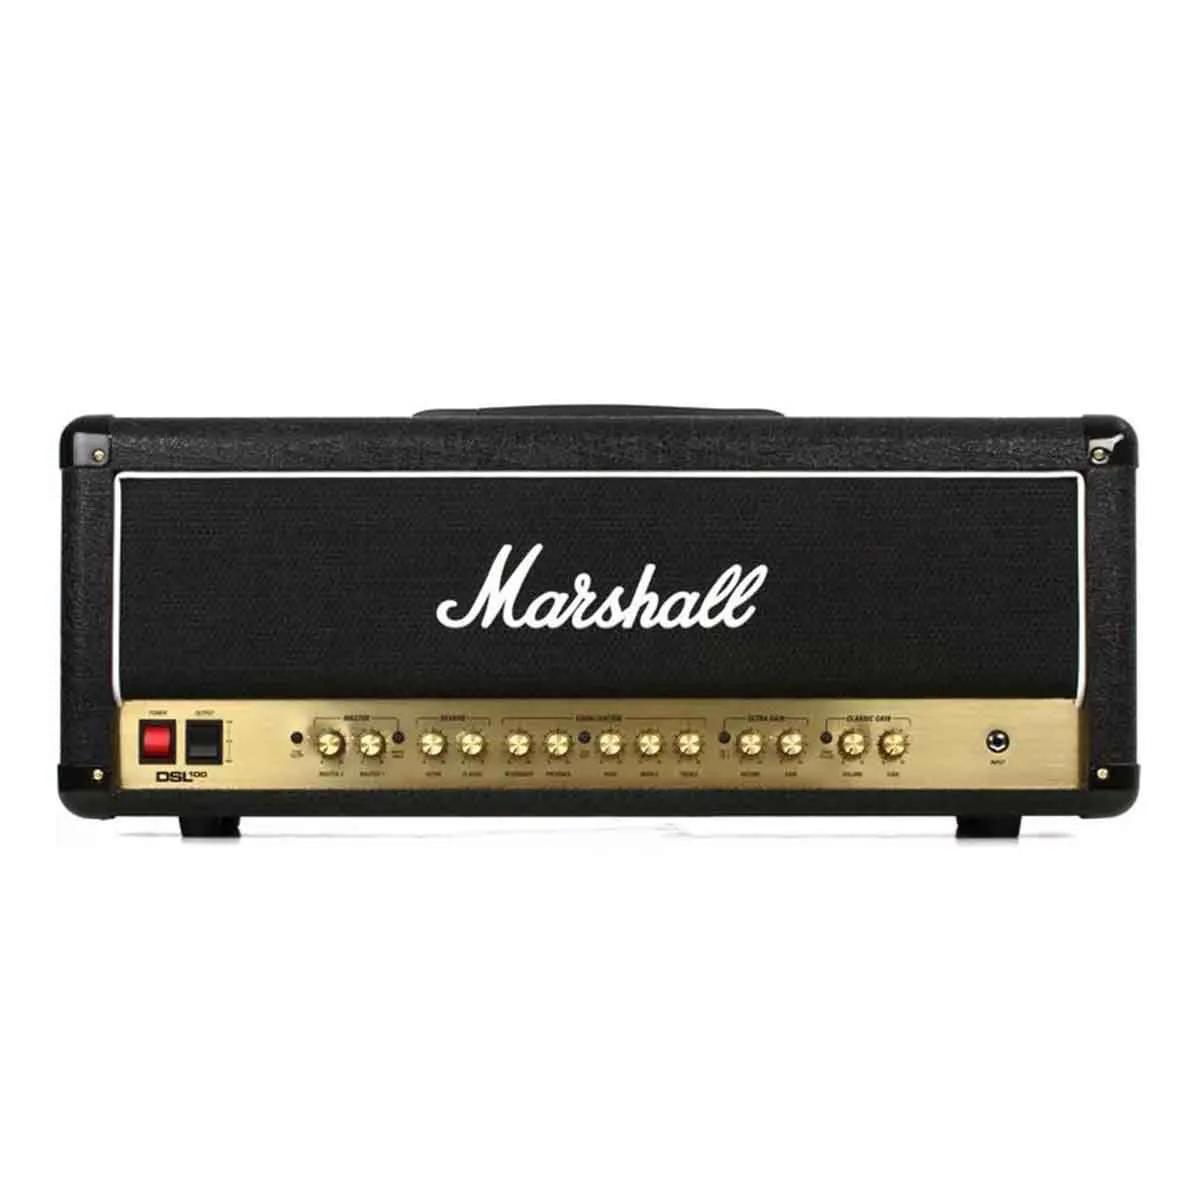 Cabeçote Marshall DSL100HR 100W para Guitarra